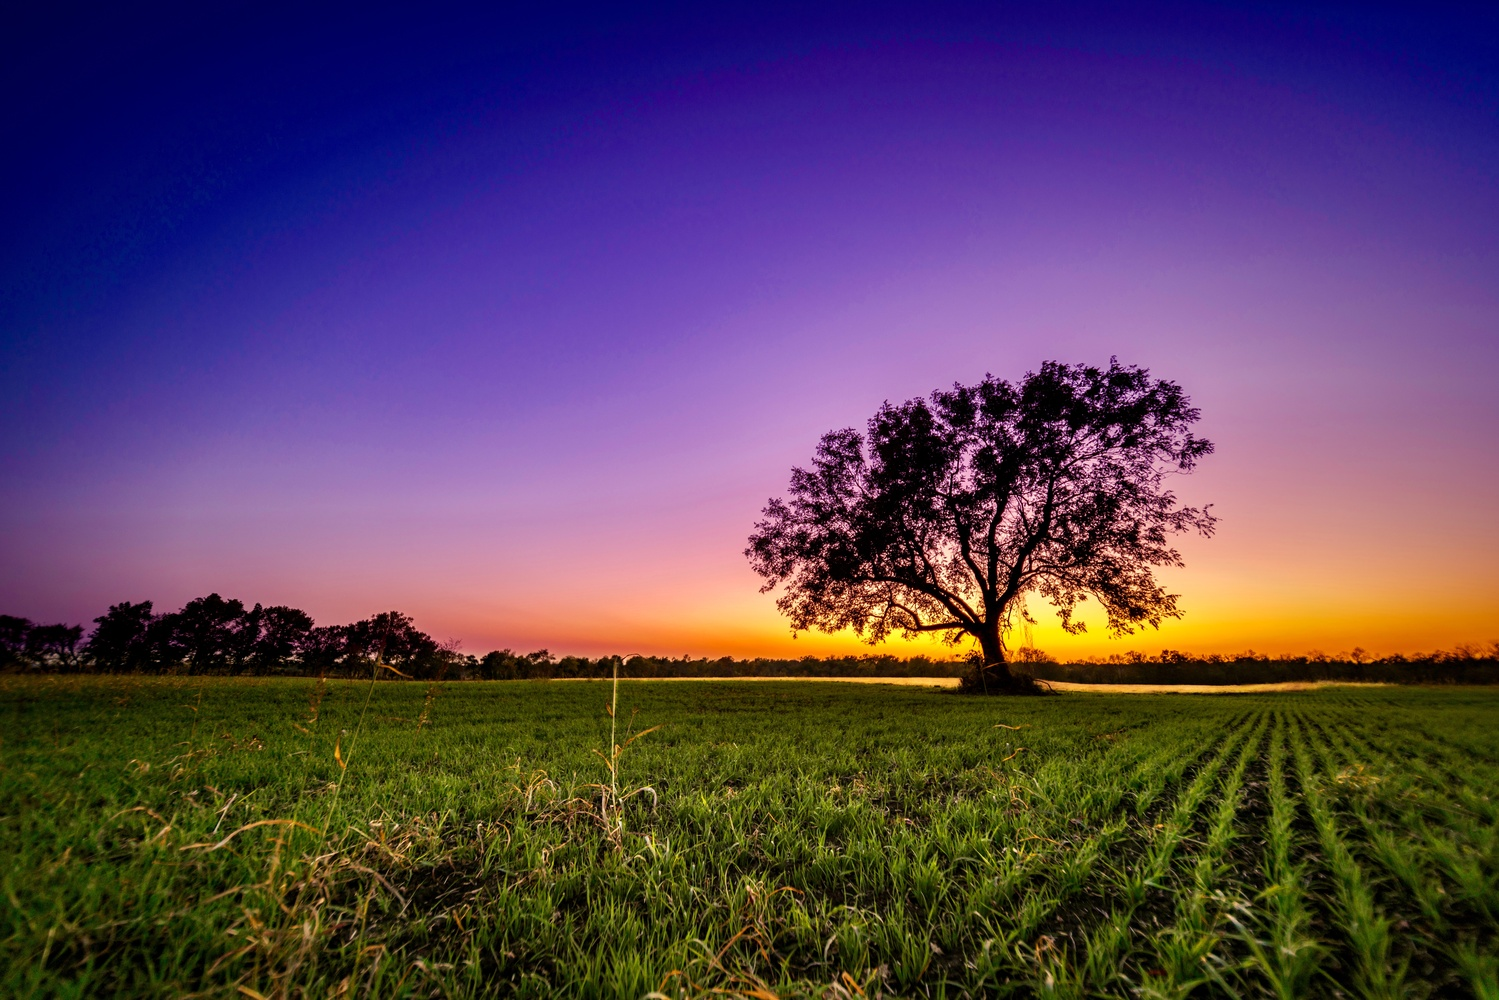 Lone Tree Sunset by Daniel Wishard